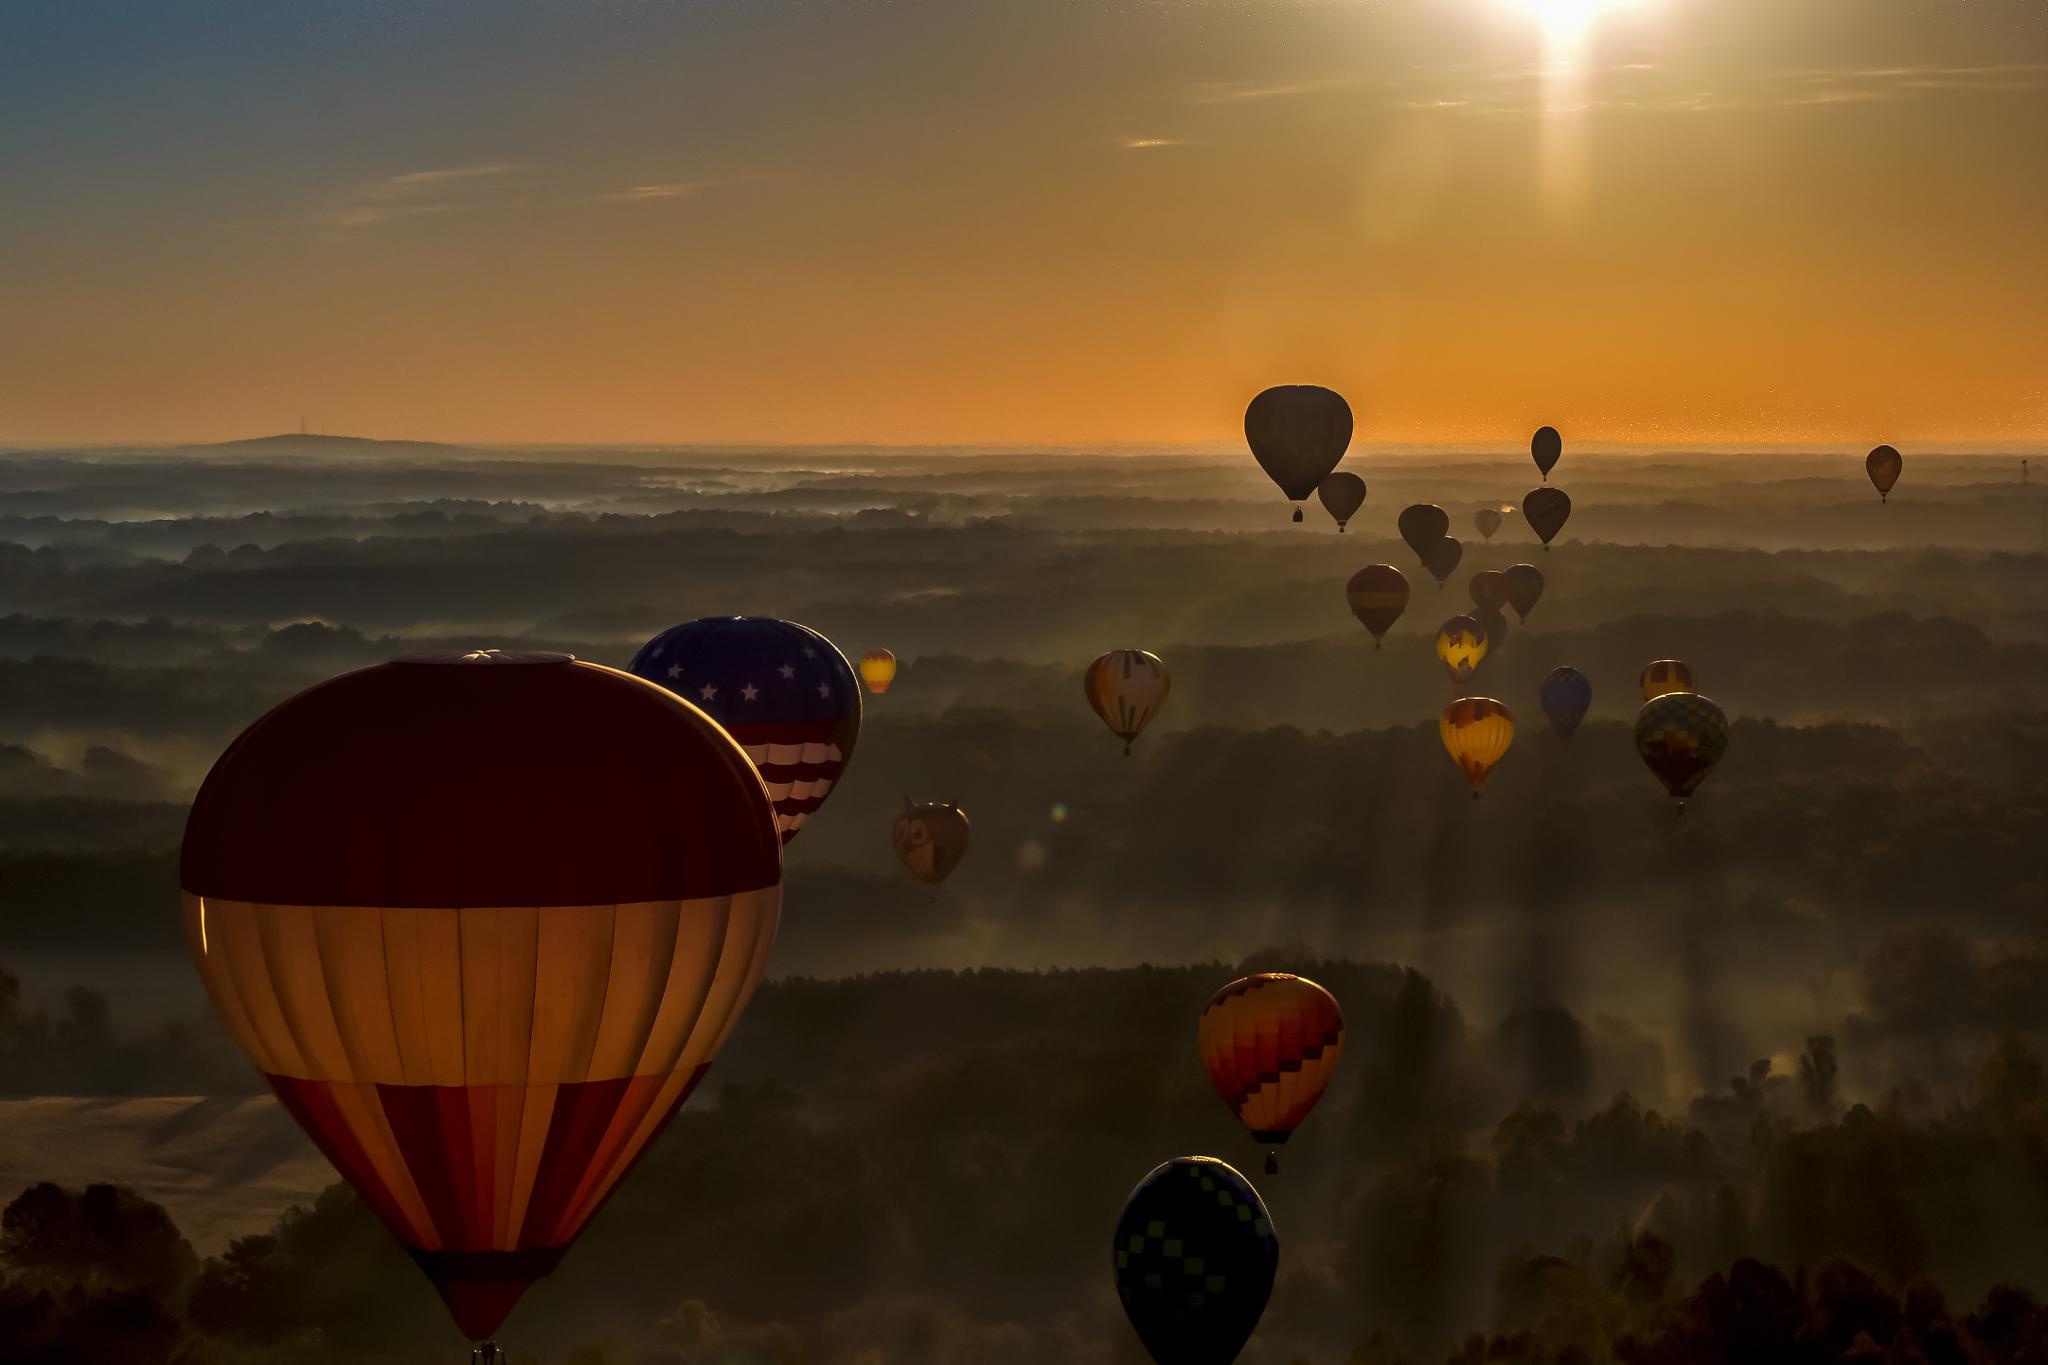 Hot Air Balloon Ride by carol.plummer